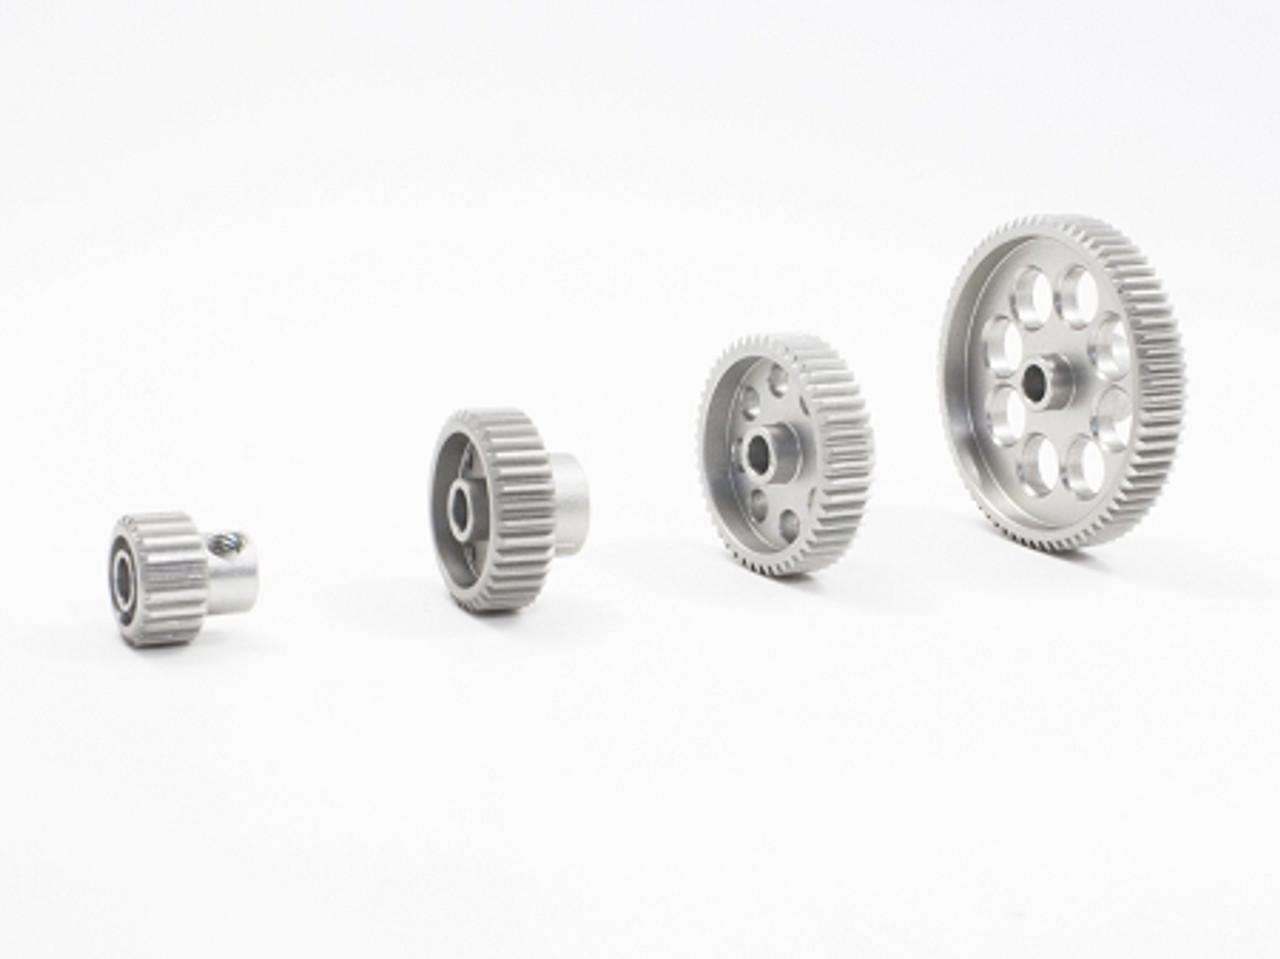 Ultra Lightweight Aluminum Pinion Gear 48 Pitch Thin 20 Tooth Trinity